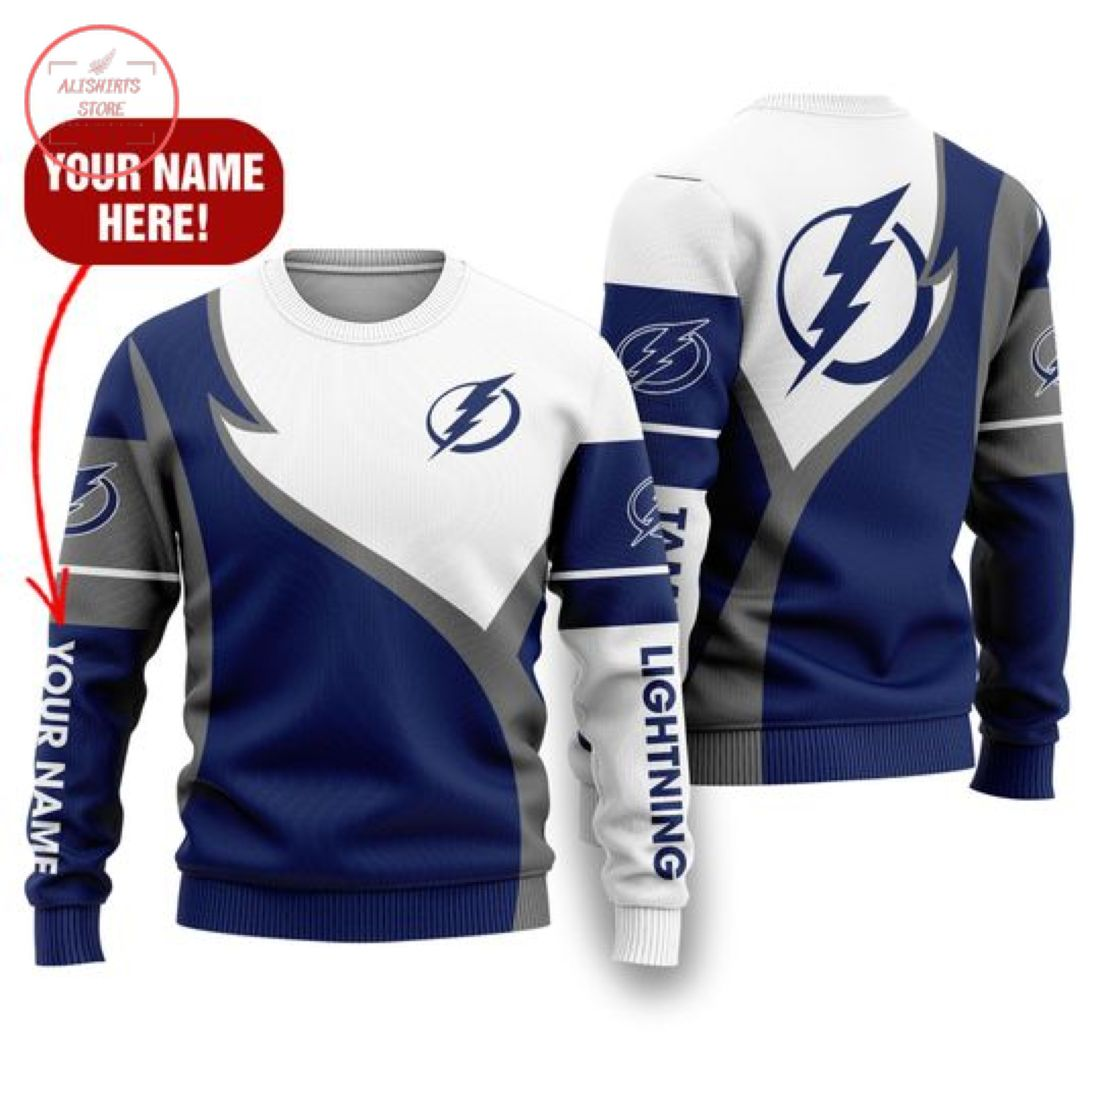 Nhl Tampa Bay Lightning Personalized Shirts